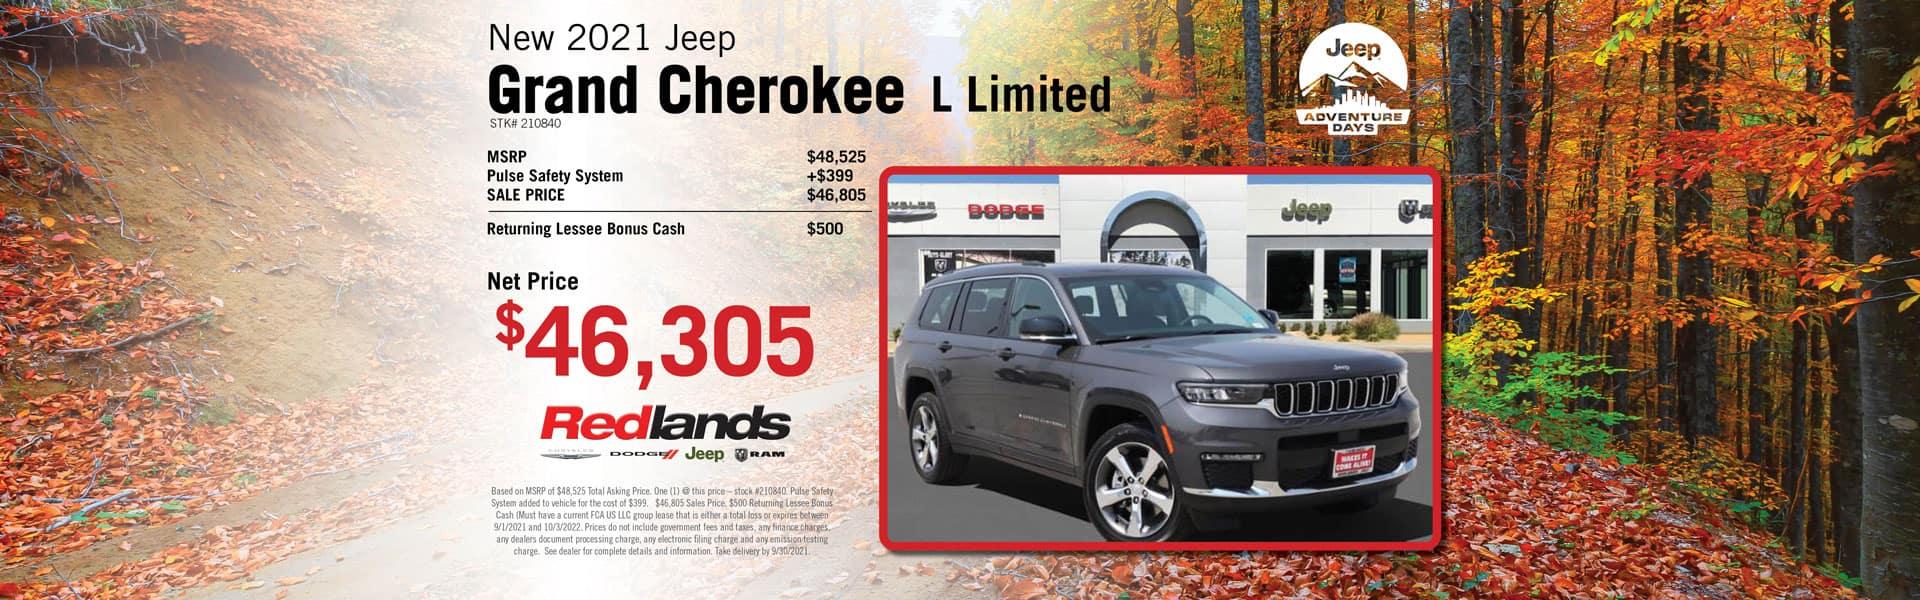 2021 Jeep Grand Cherokee L Buy Offer   Redlands CDJR